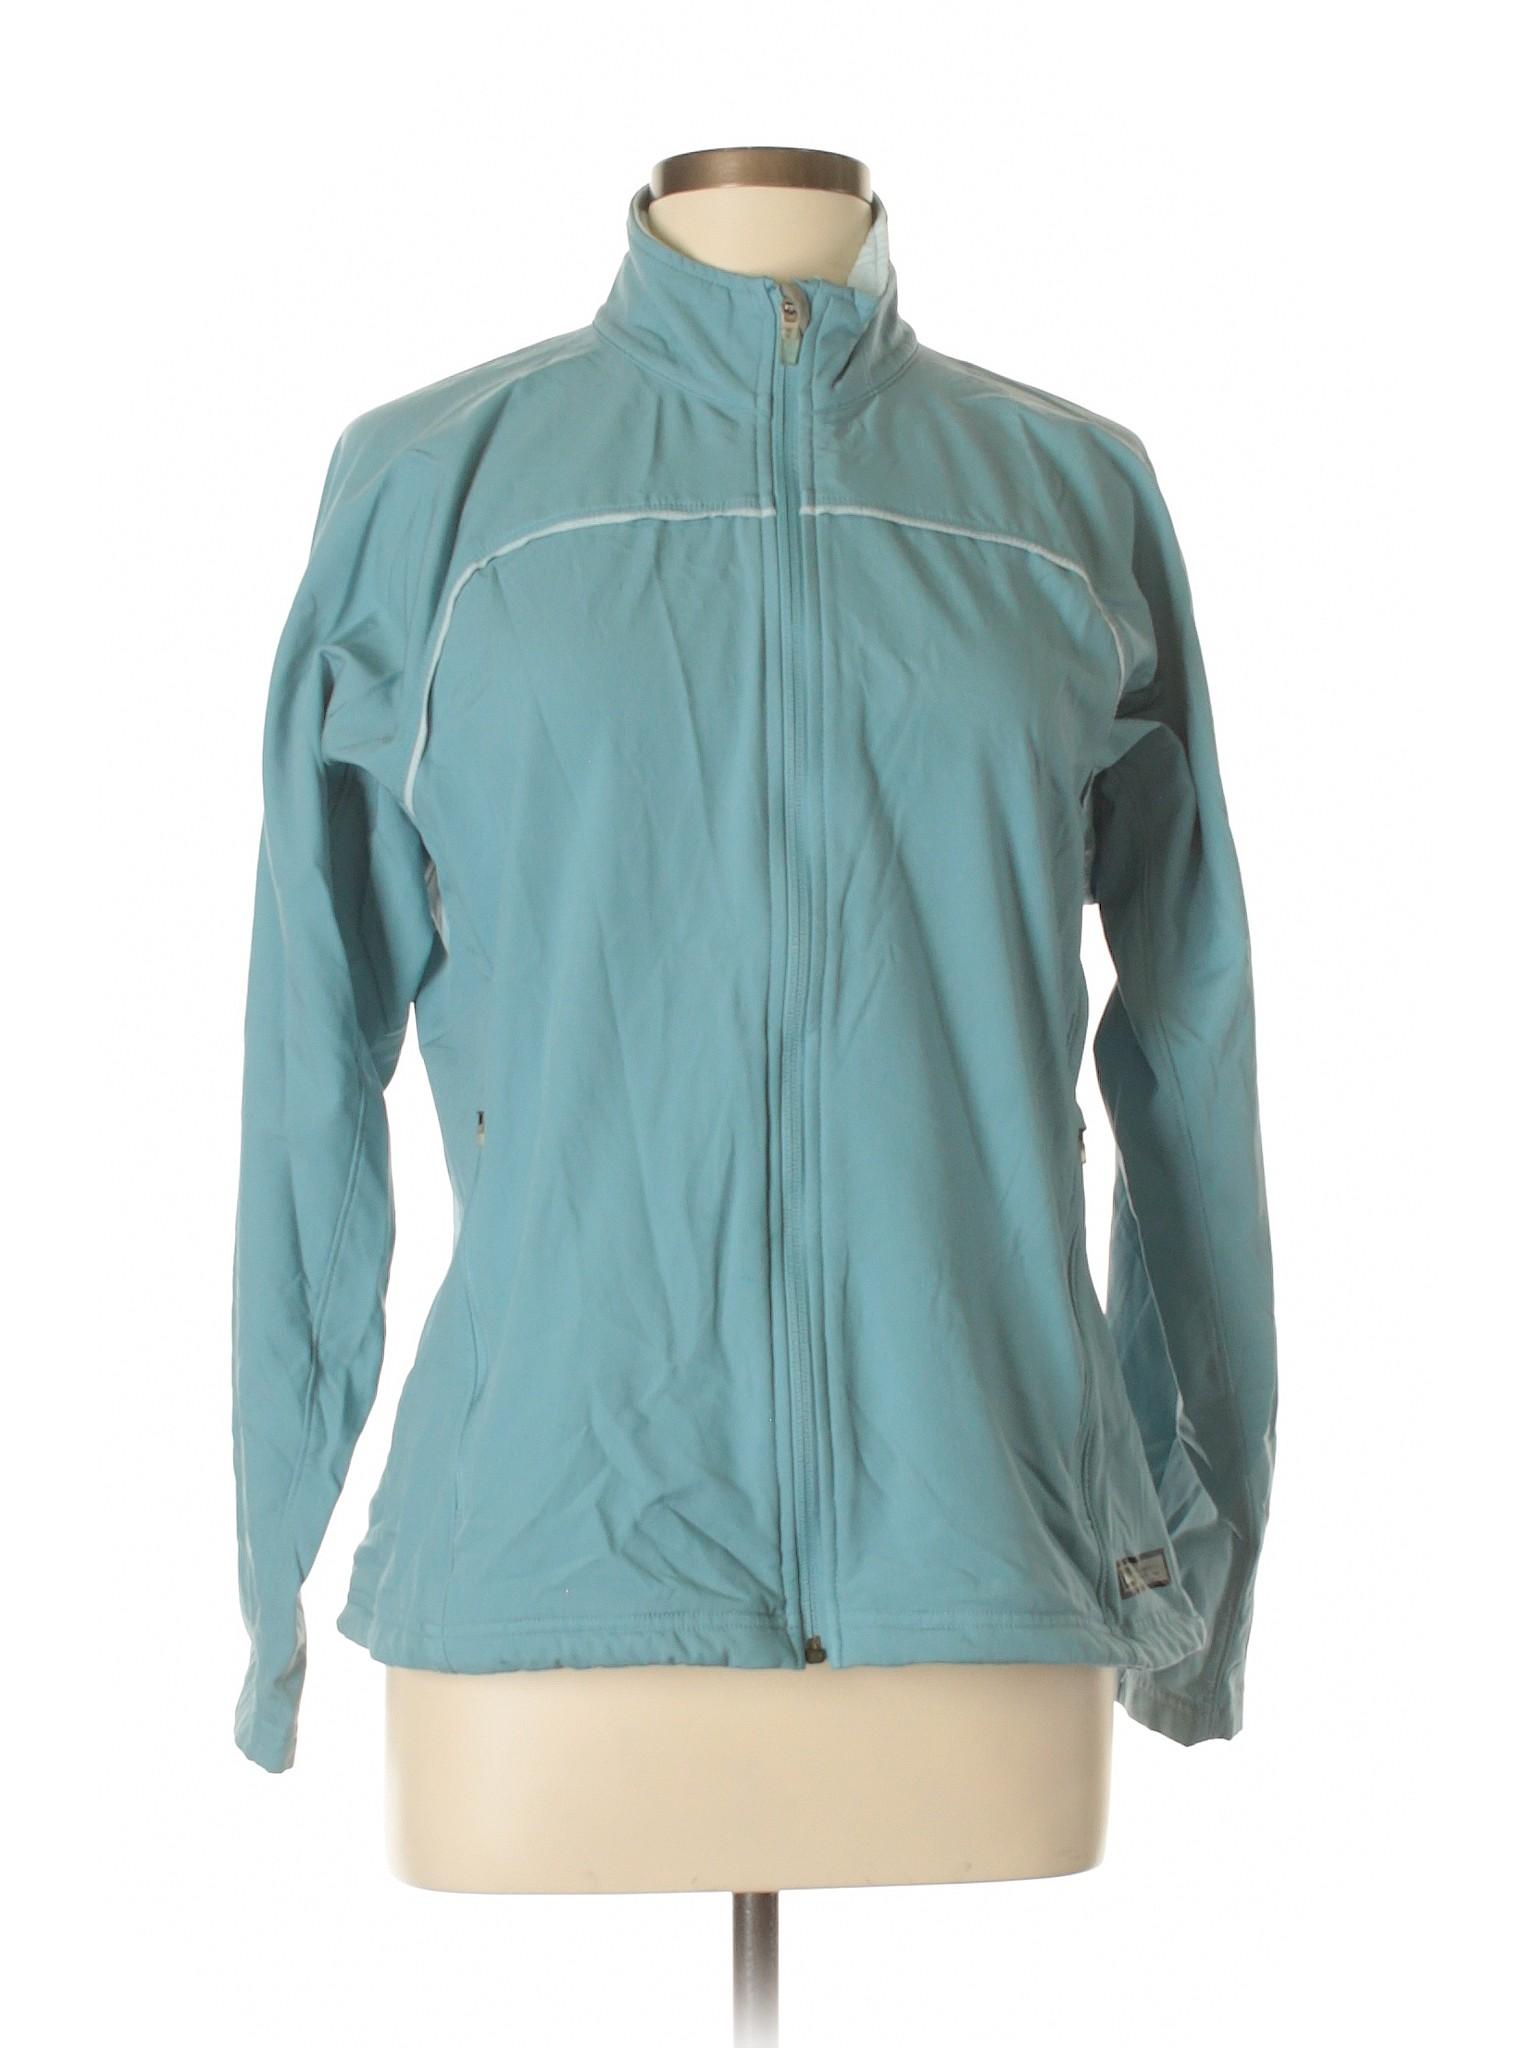 Track Boutique Jacket leisure REI Boutique leisure Bqx4I8wa8